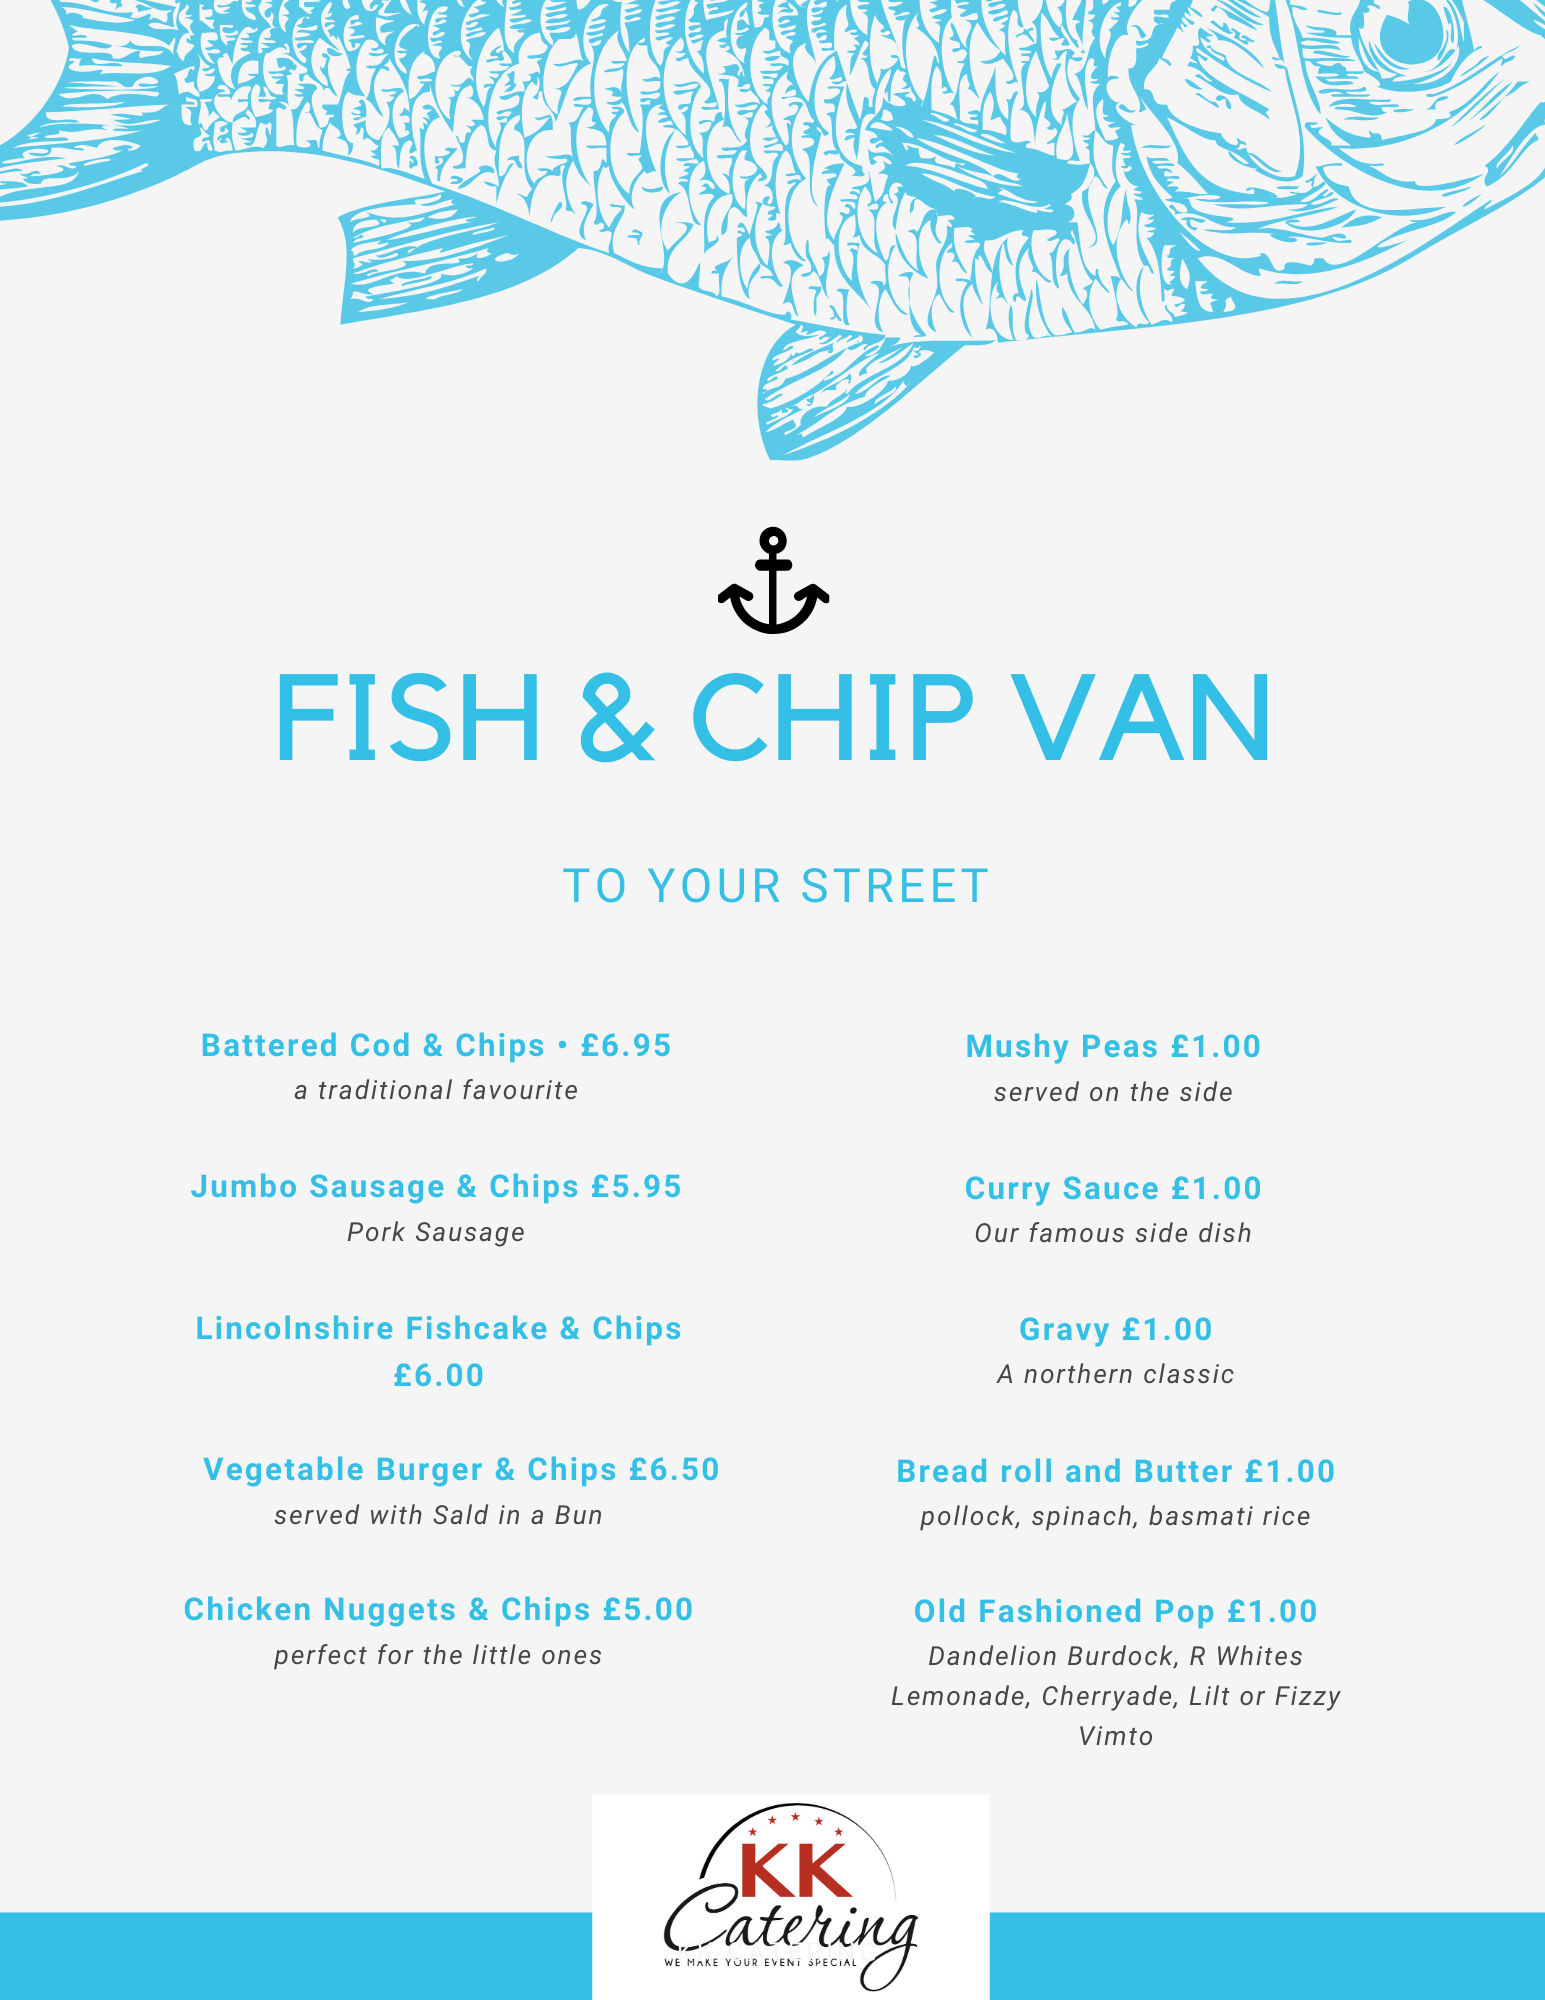 Fish-Chip-Van-Cash-Sales